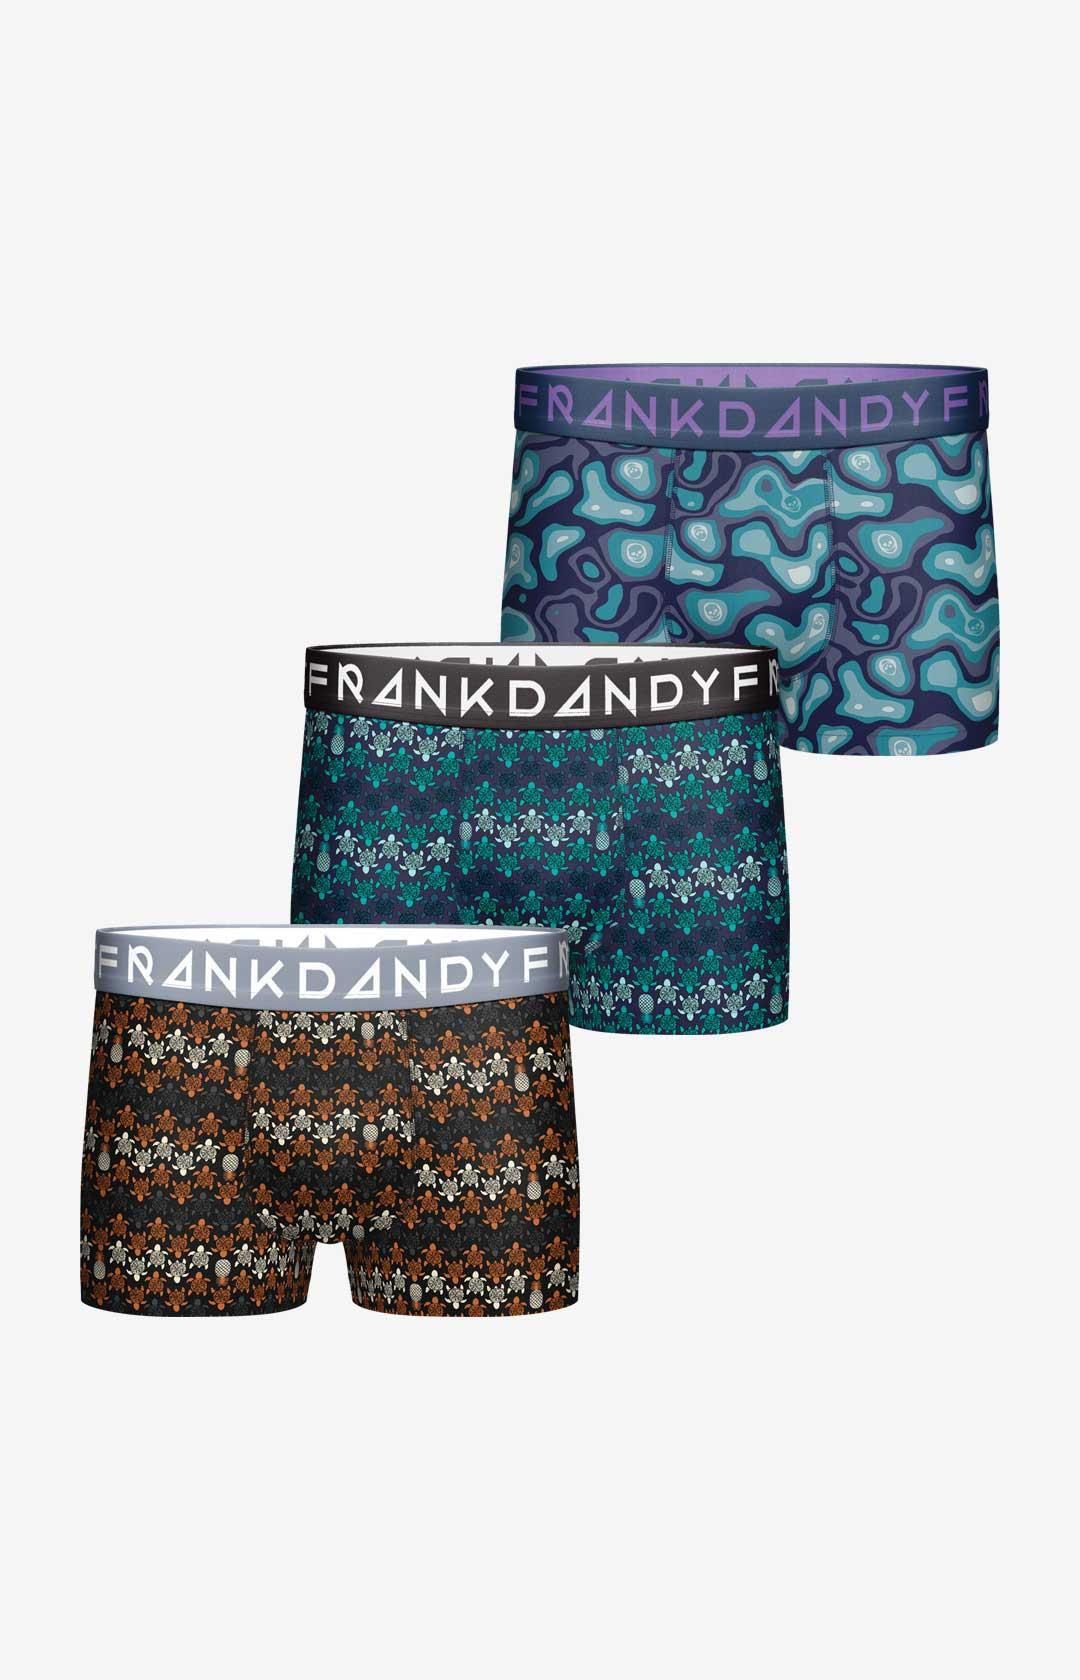 Frank Dandy 3-Pack Kids Boxer